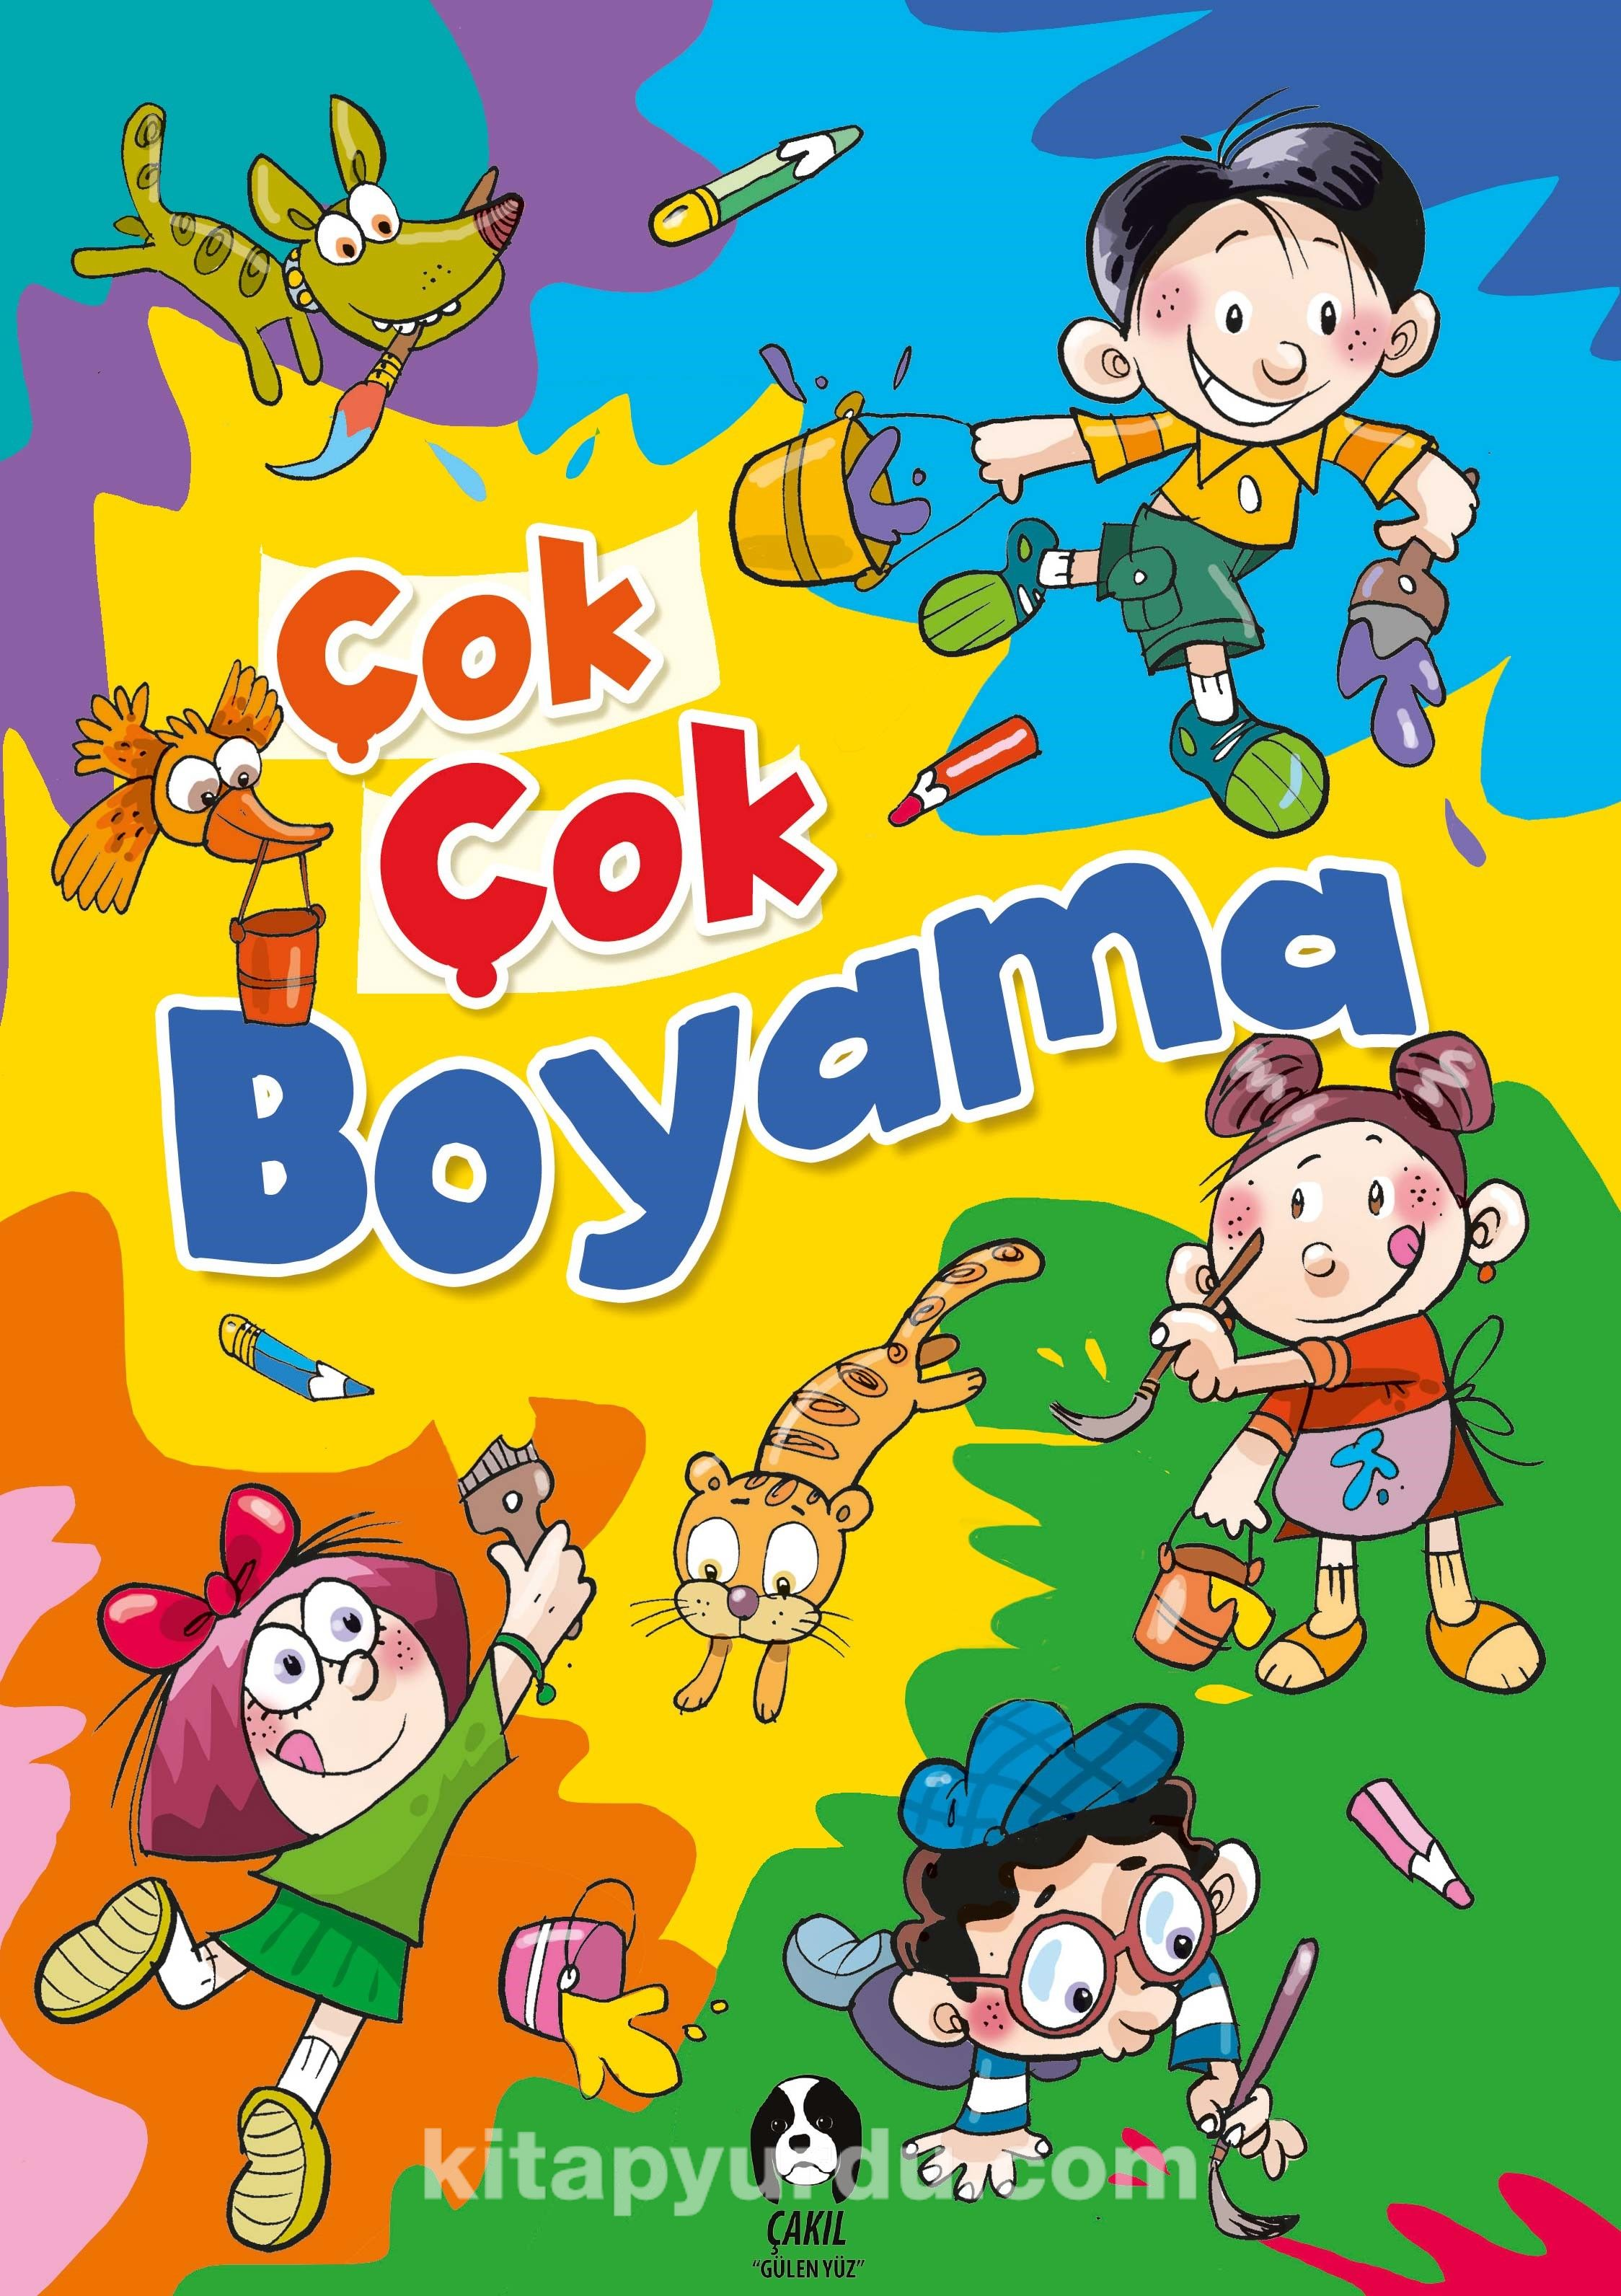 Cok Cok Boyama Kollektif Kitapyurdu Com